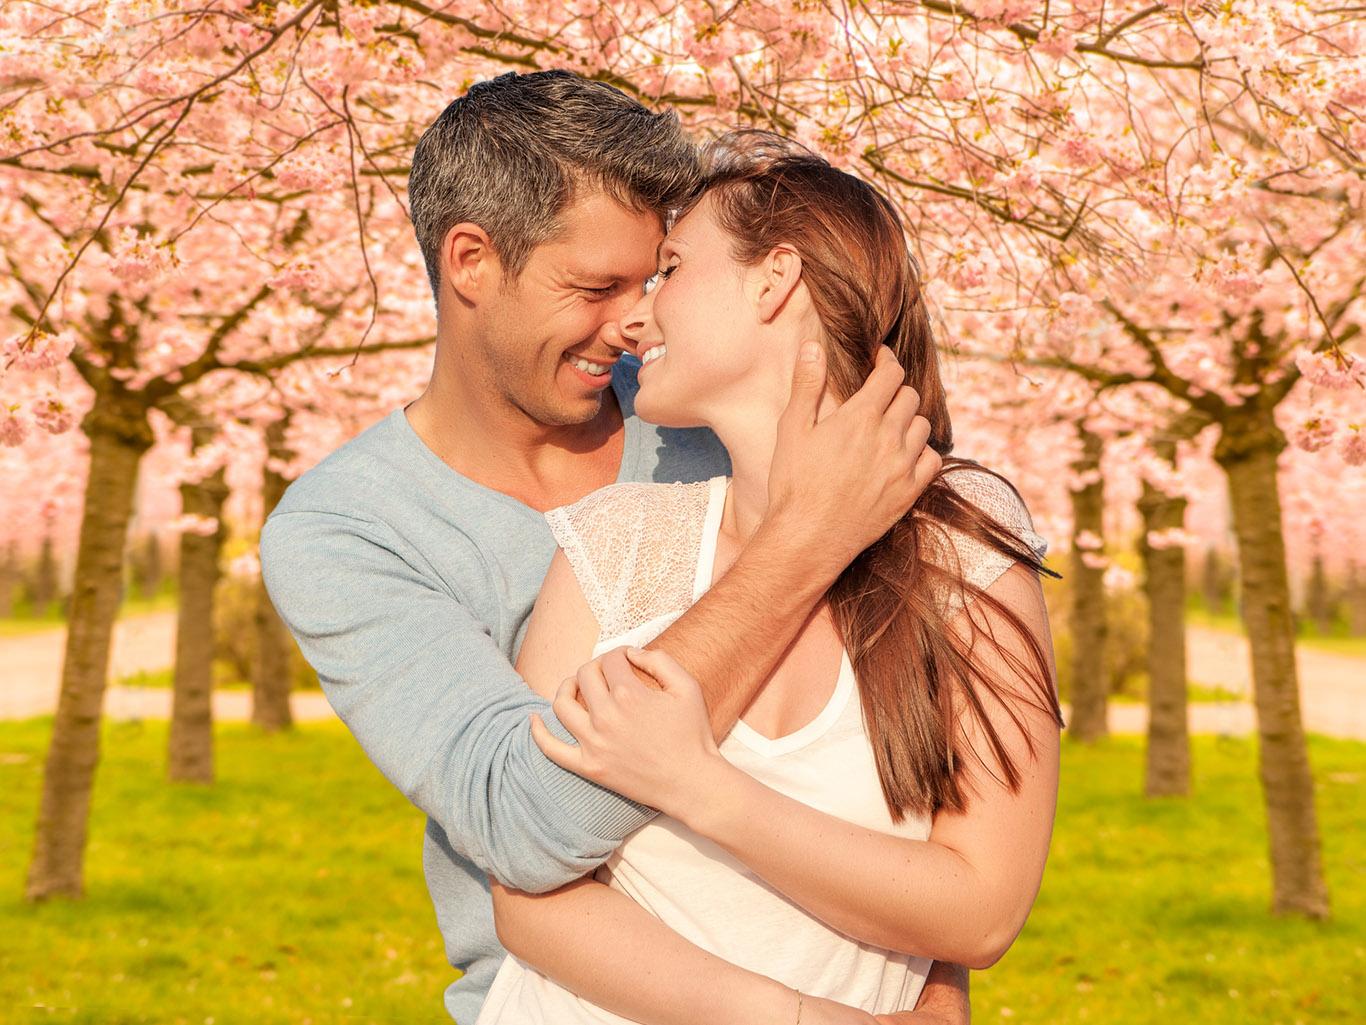 мужчина и женщина.отношения от знакомства